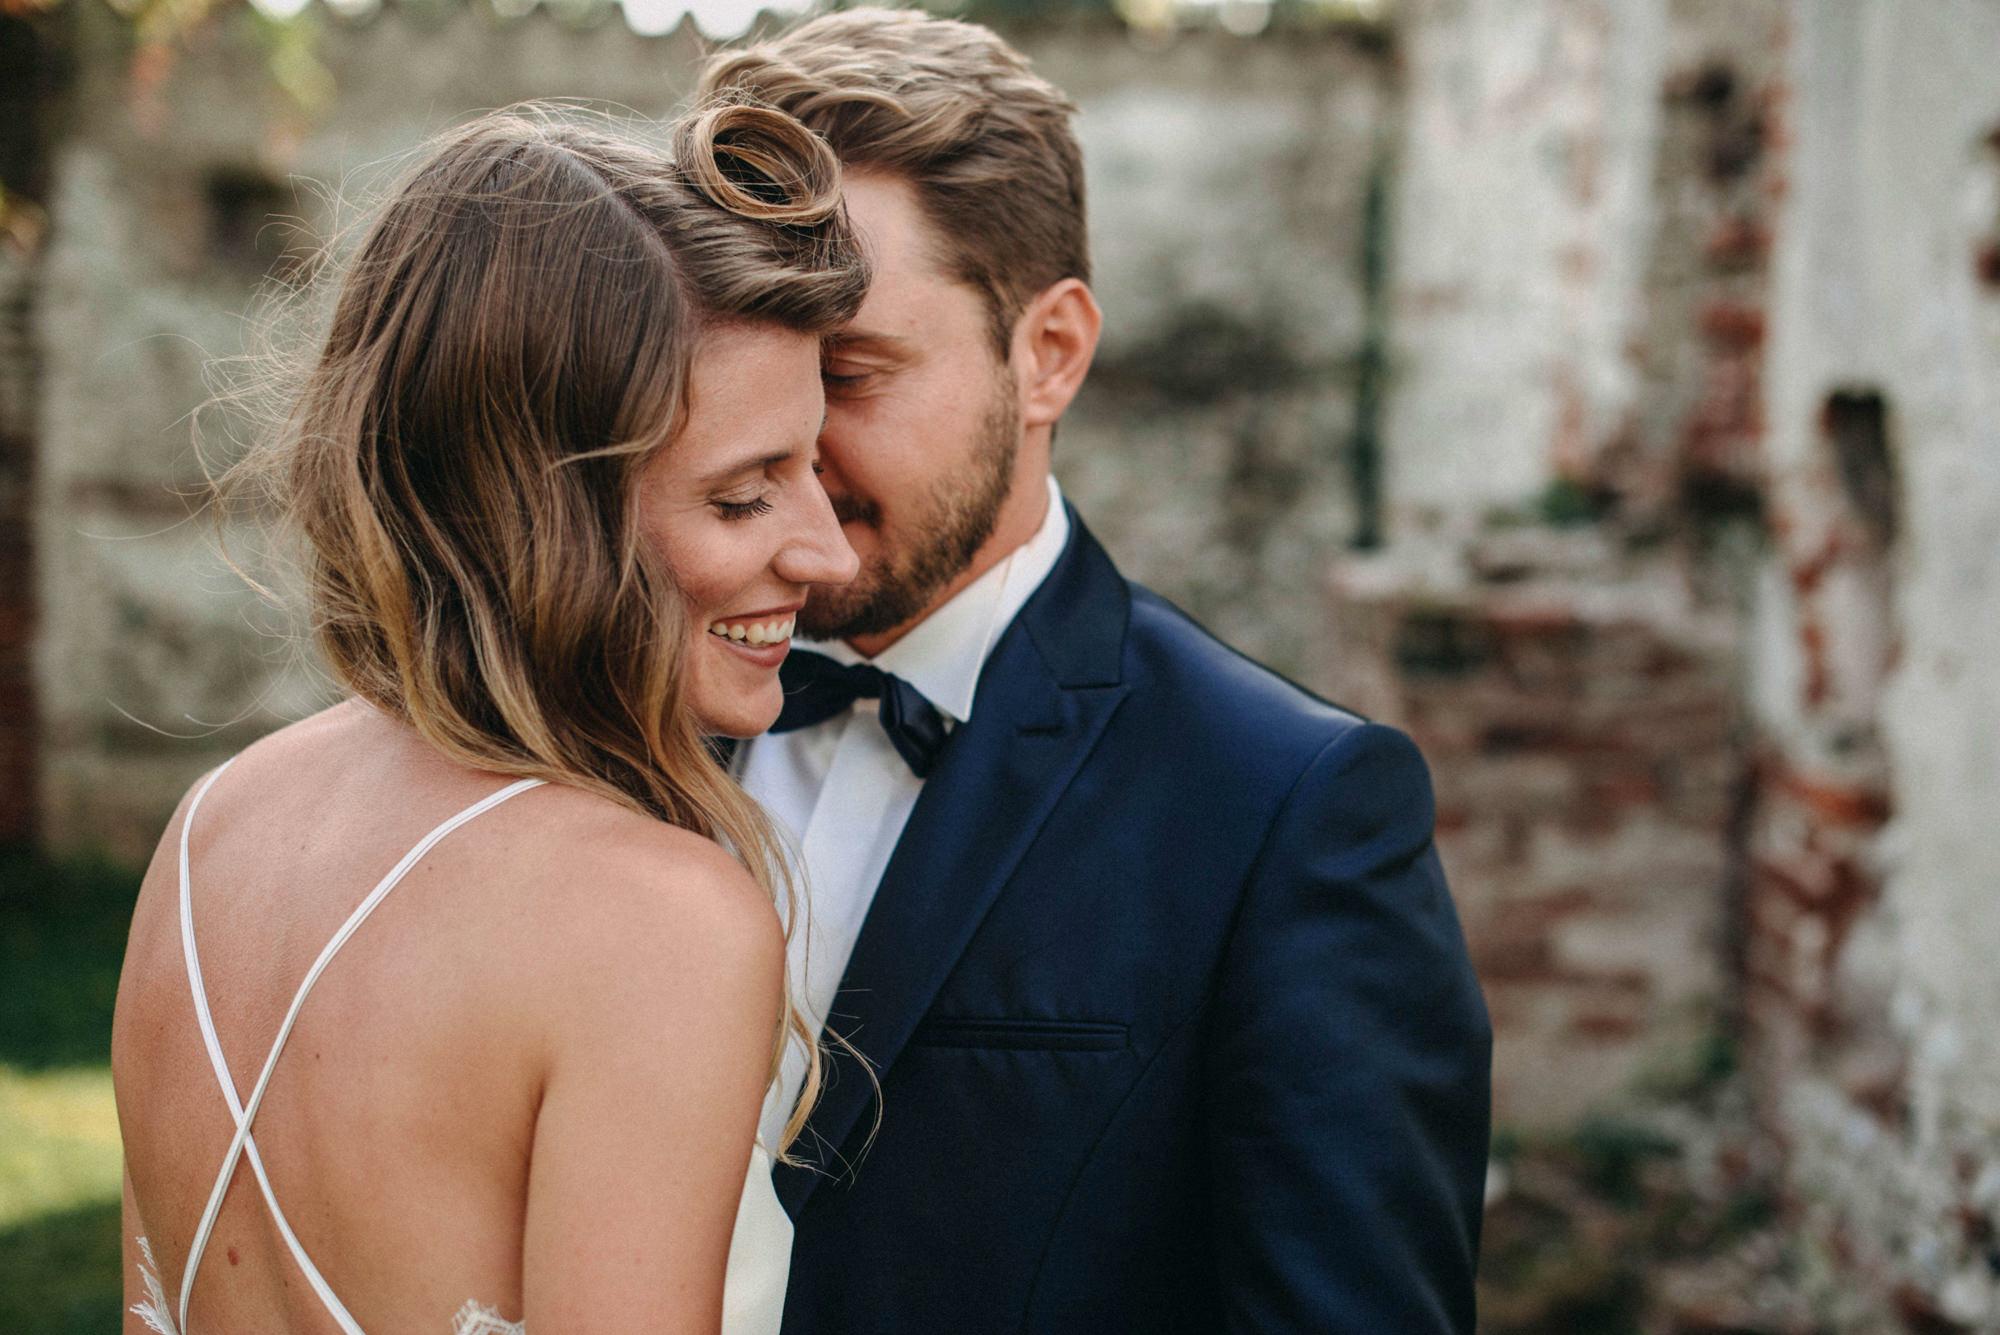 destination wedding photographer italy 024 - Wedding Photographer Venice